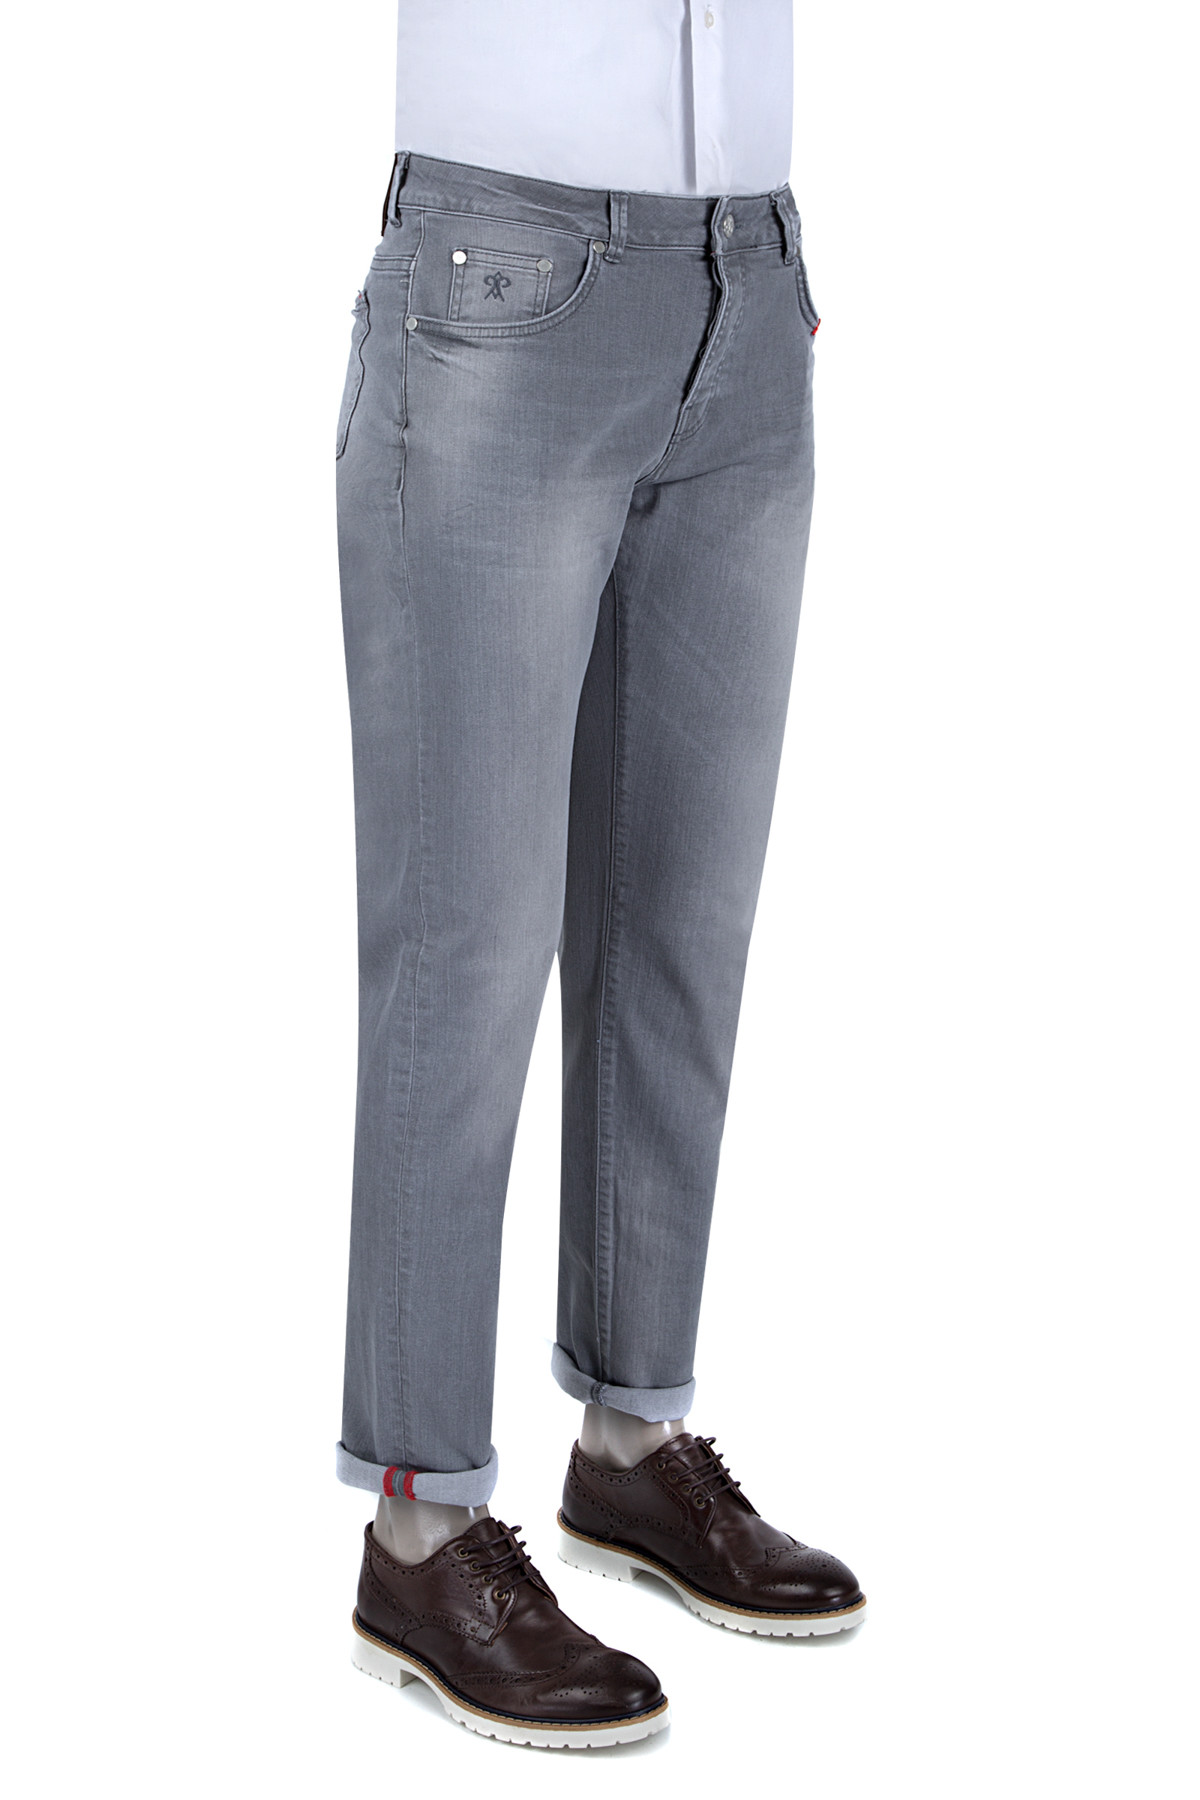 Damat Gri Pantolon Denım - 8DCJ30400910-301 1